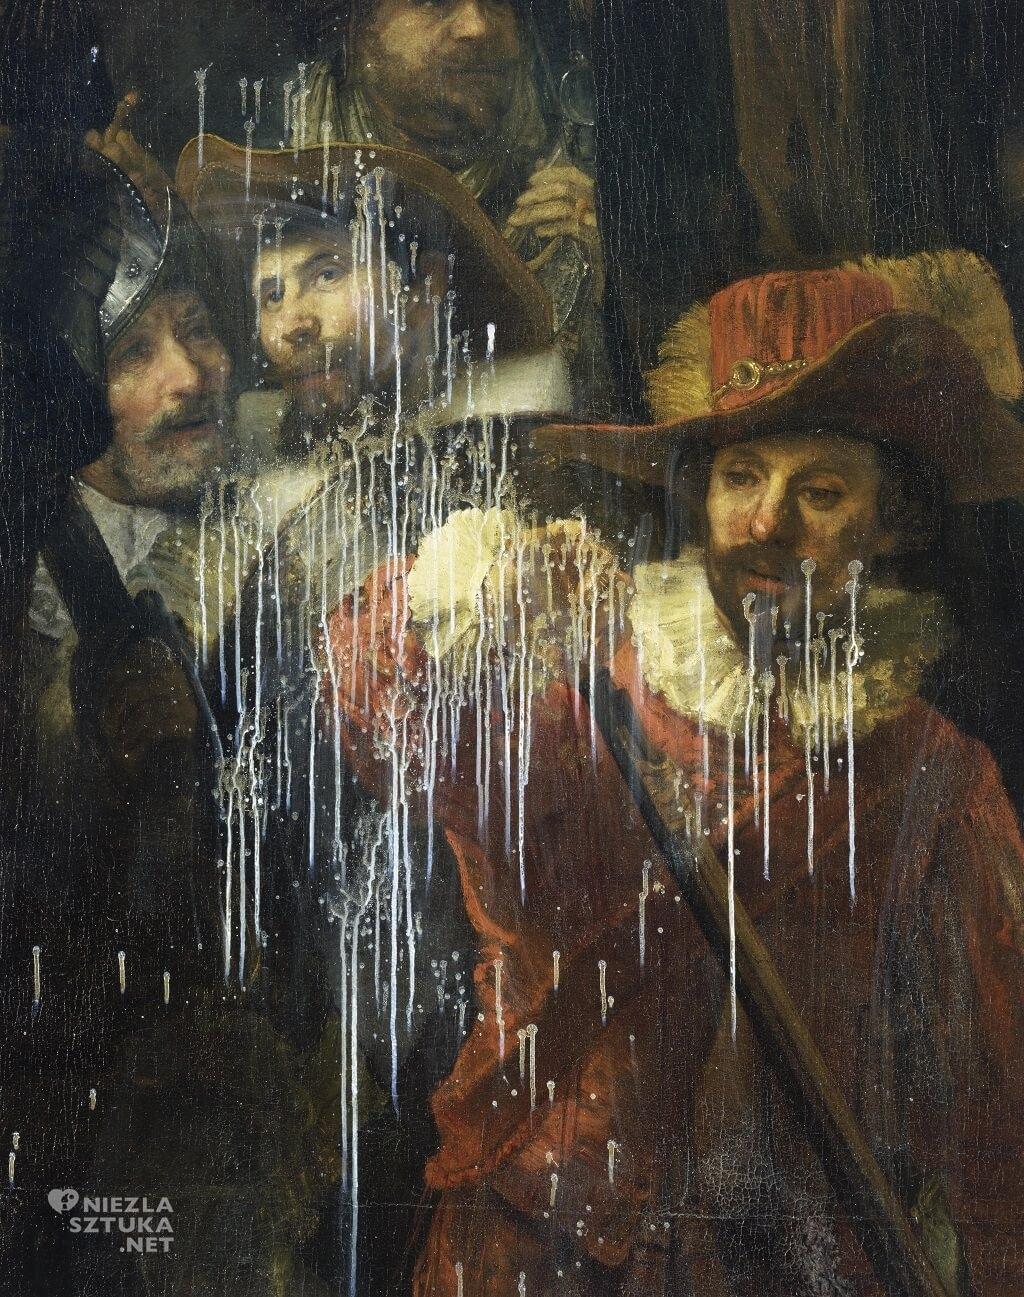 Atak kwasem na obraz <em>Straż nocna</em> w 1990, fot. Rijksmuseum